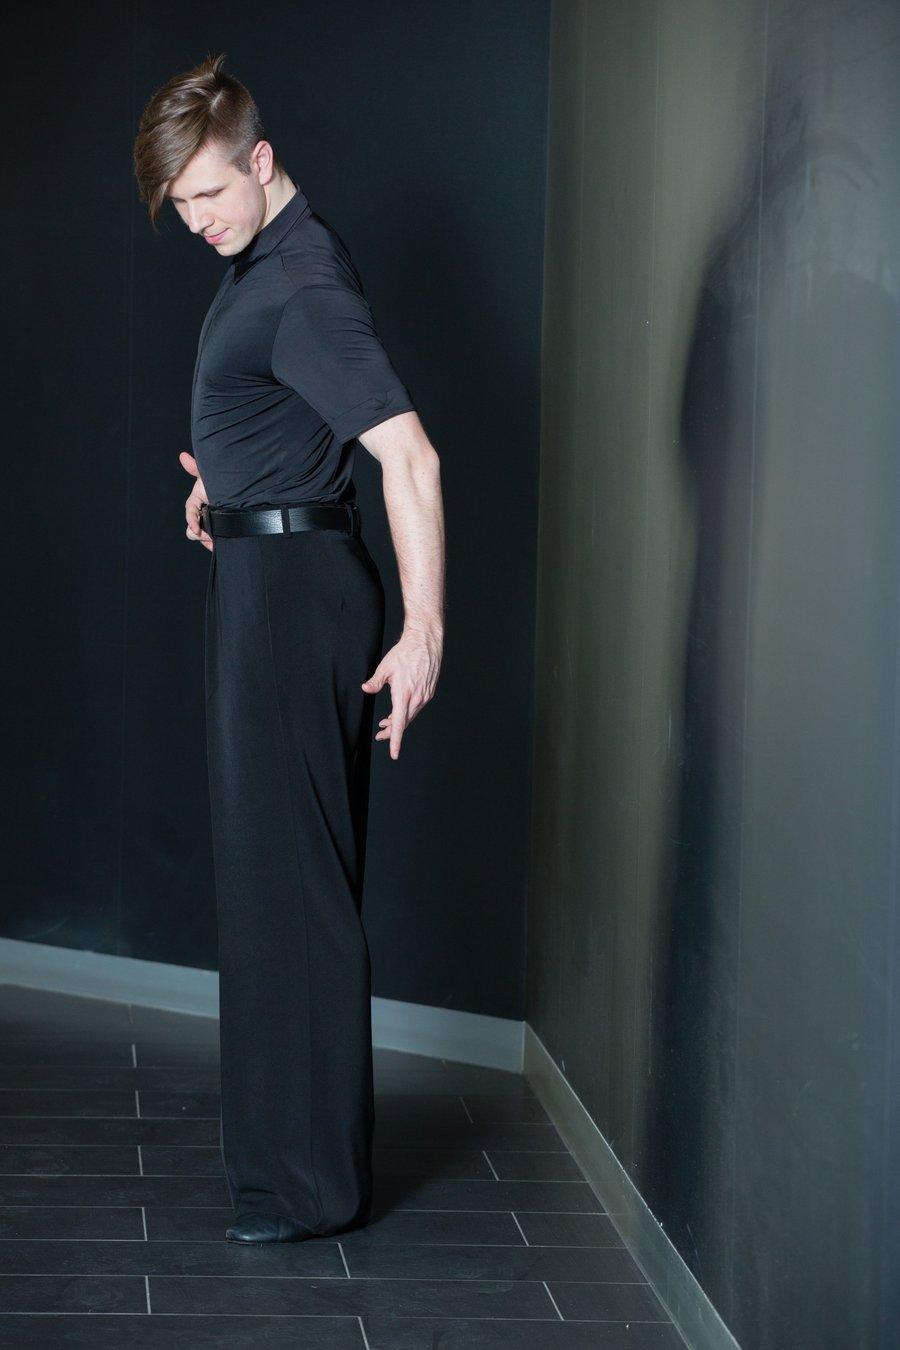 Image of B3551C Mens Single Pleat Pants SALE Dancewear latin ballroom